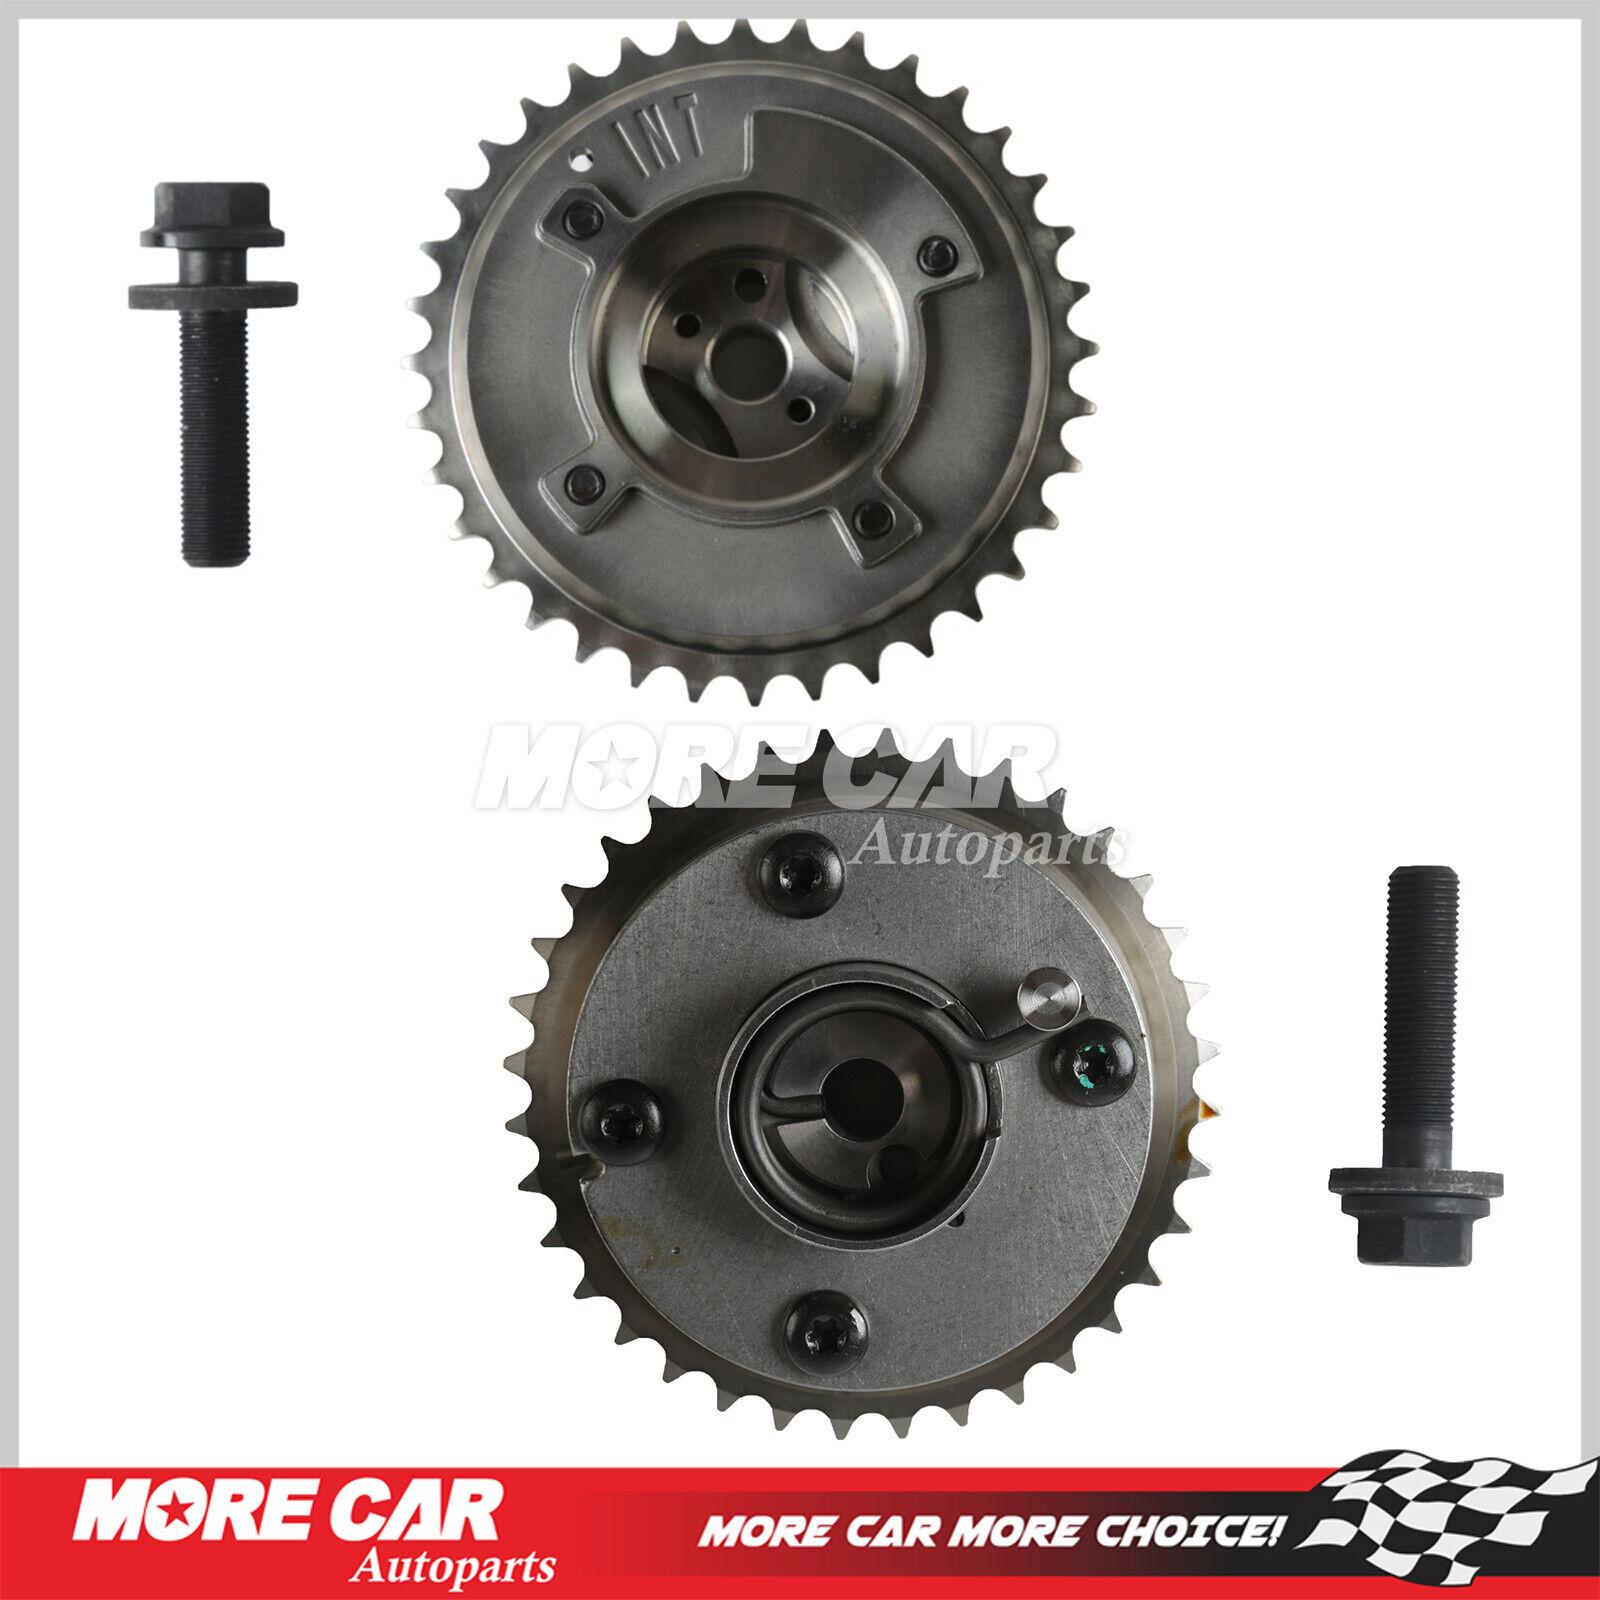 MOCA VVT Actuator Cam Phaser Sprockets Intake /& Exhaust for 2009-2014 Toyota Camry RAV4 Highlander /& 2013 Lexus ES300H 2.5L 2.7L L4